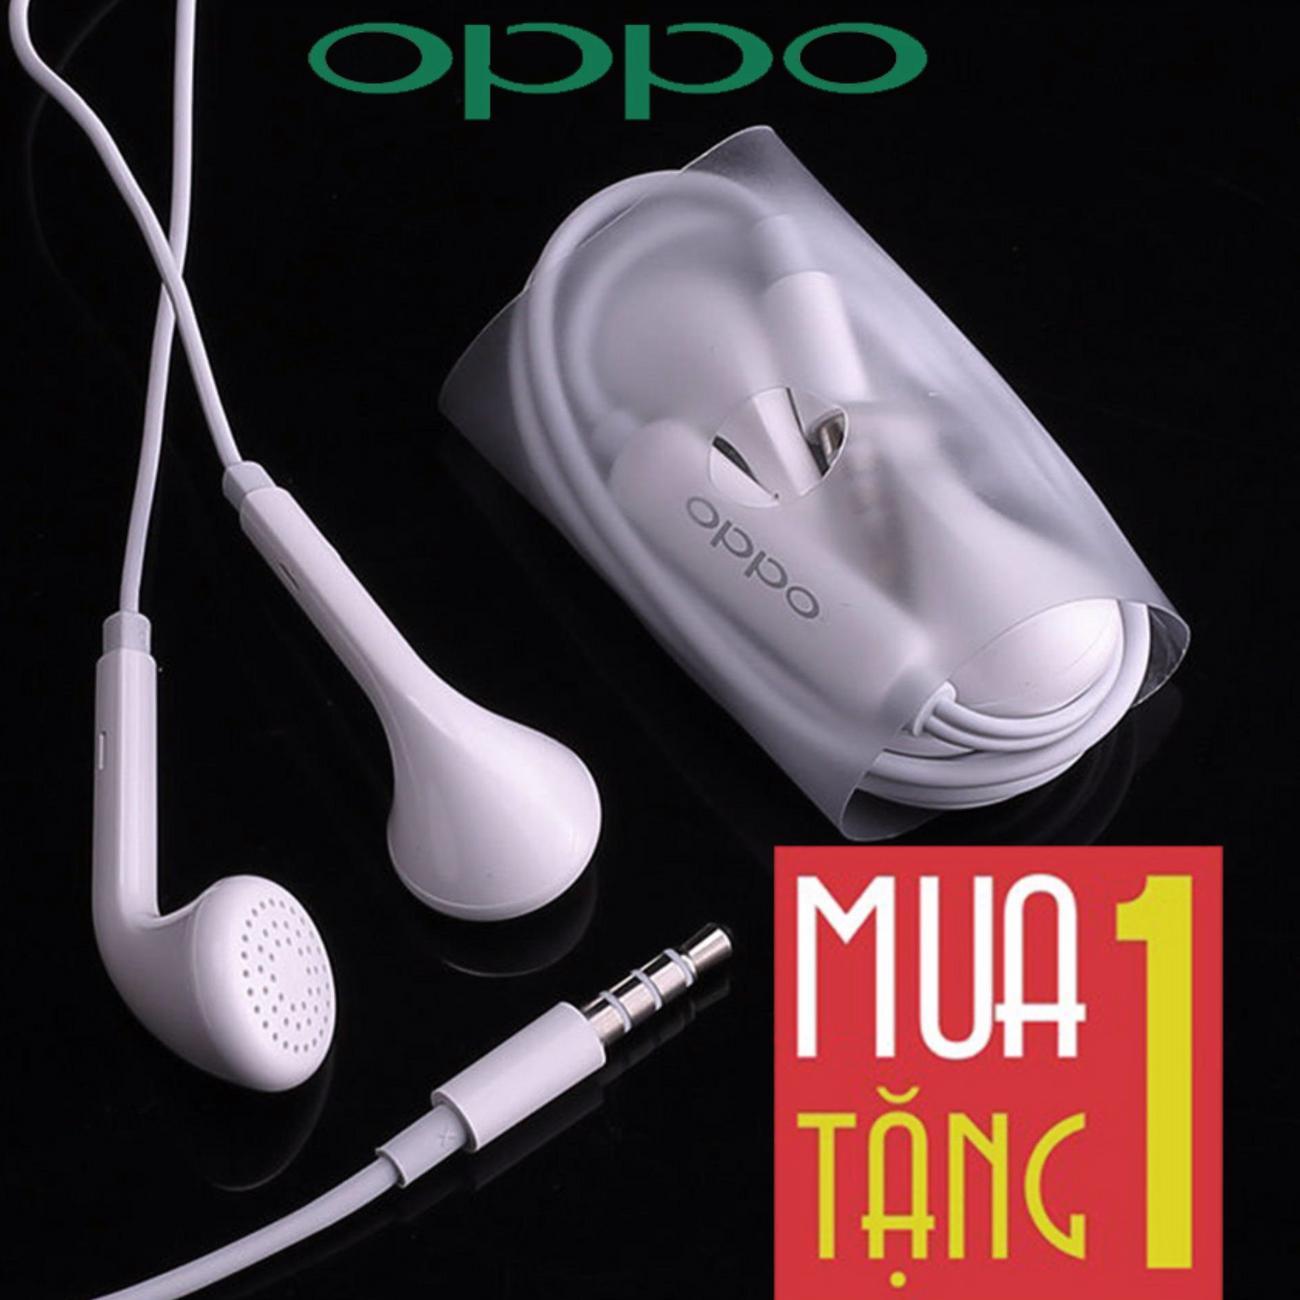 Tai nghe Oppo F3/F3 Plus F1s/F1 Plus R9/R9 Plus + Tặng 1 Tai nghe Tai nghe Oppo F3/F3 - Zin Tuyệt Đối